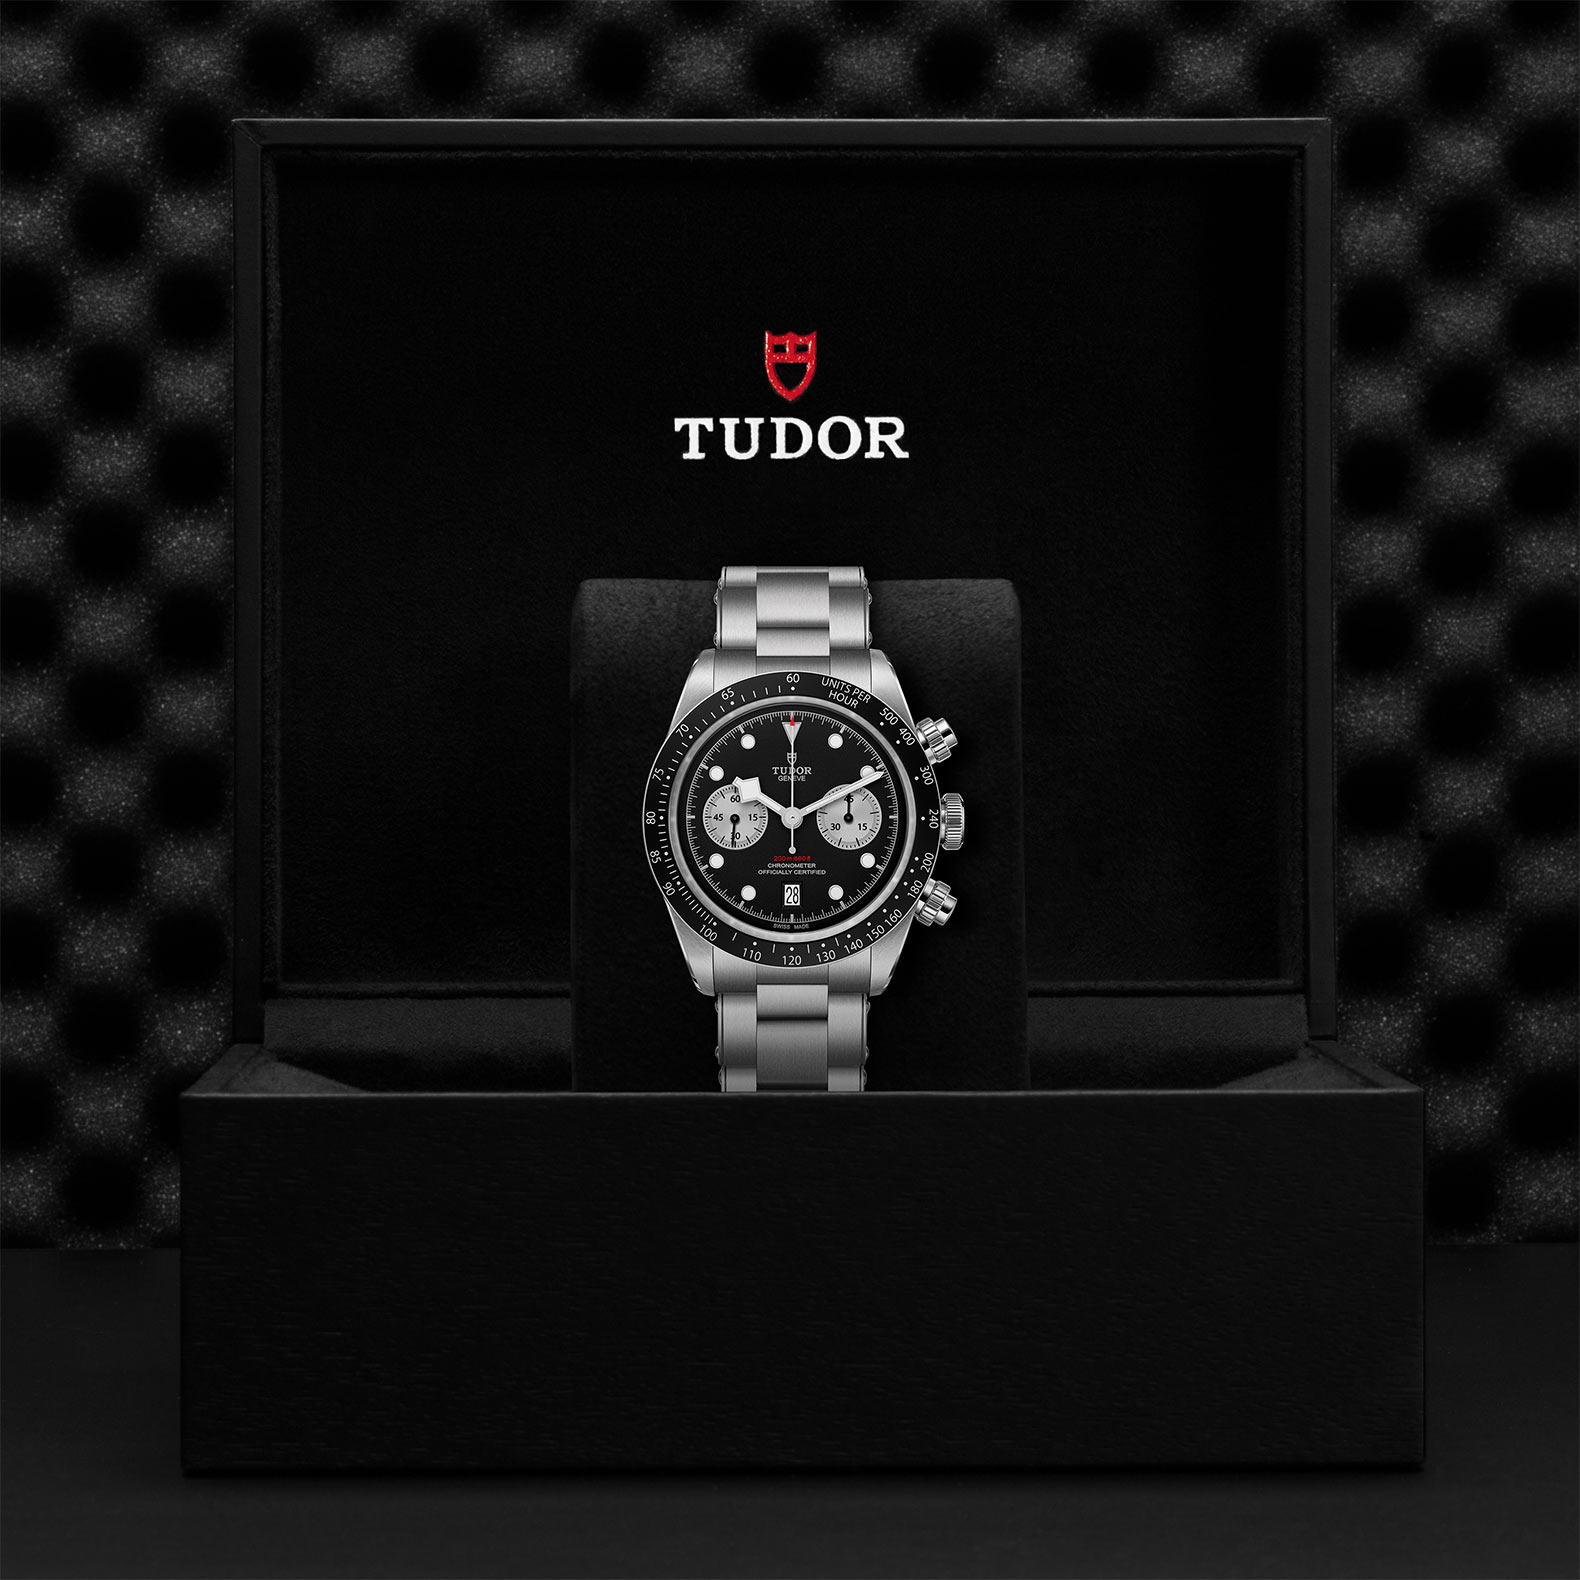 TUDOR Black Bay Chrono - M79360N-0001